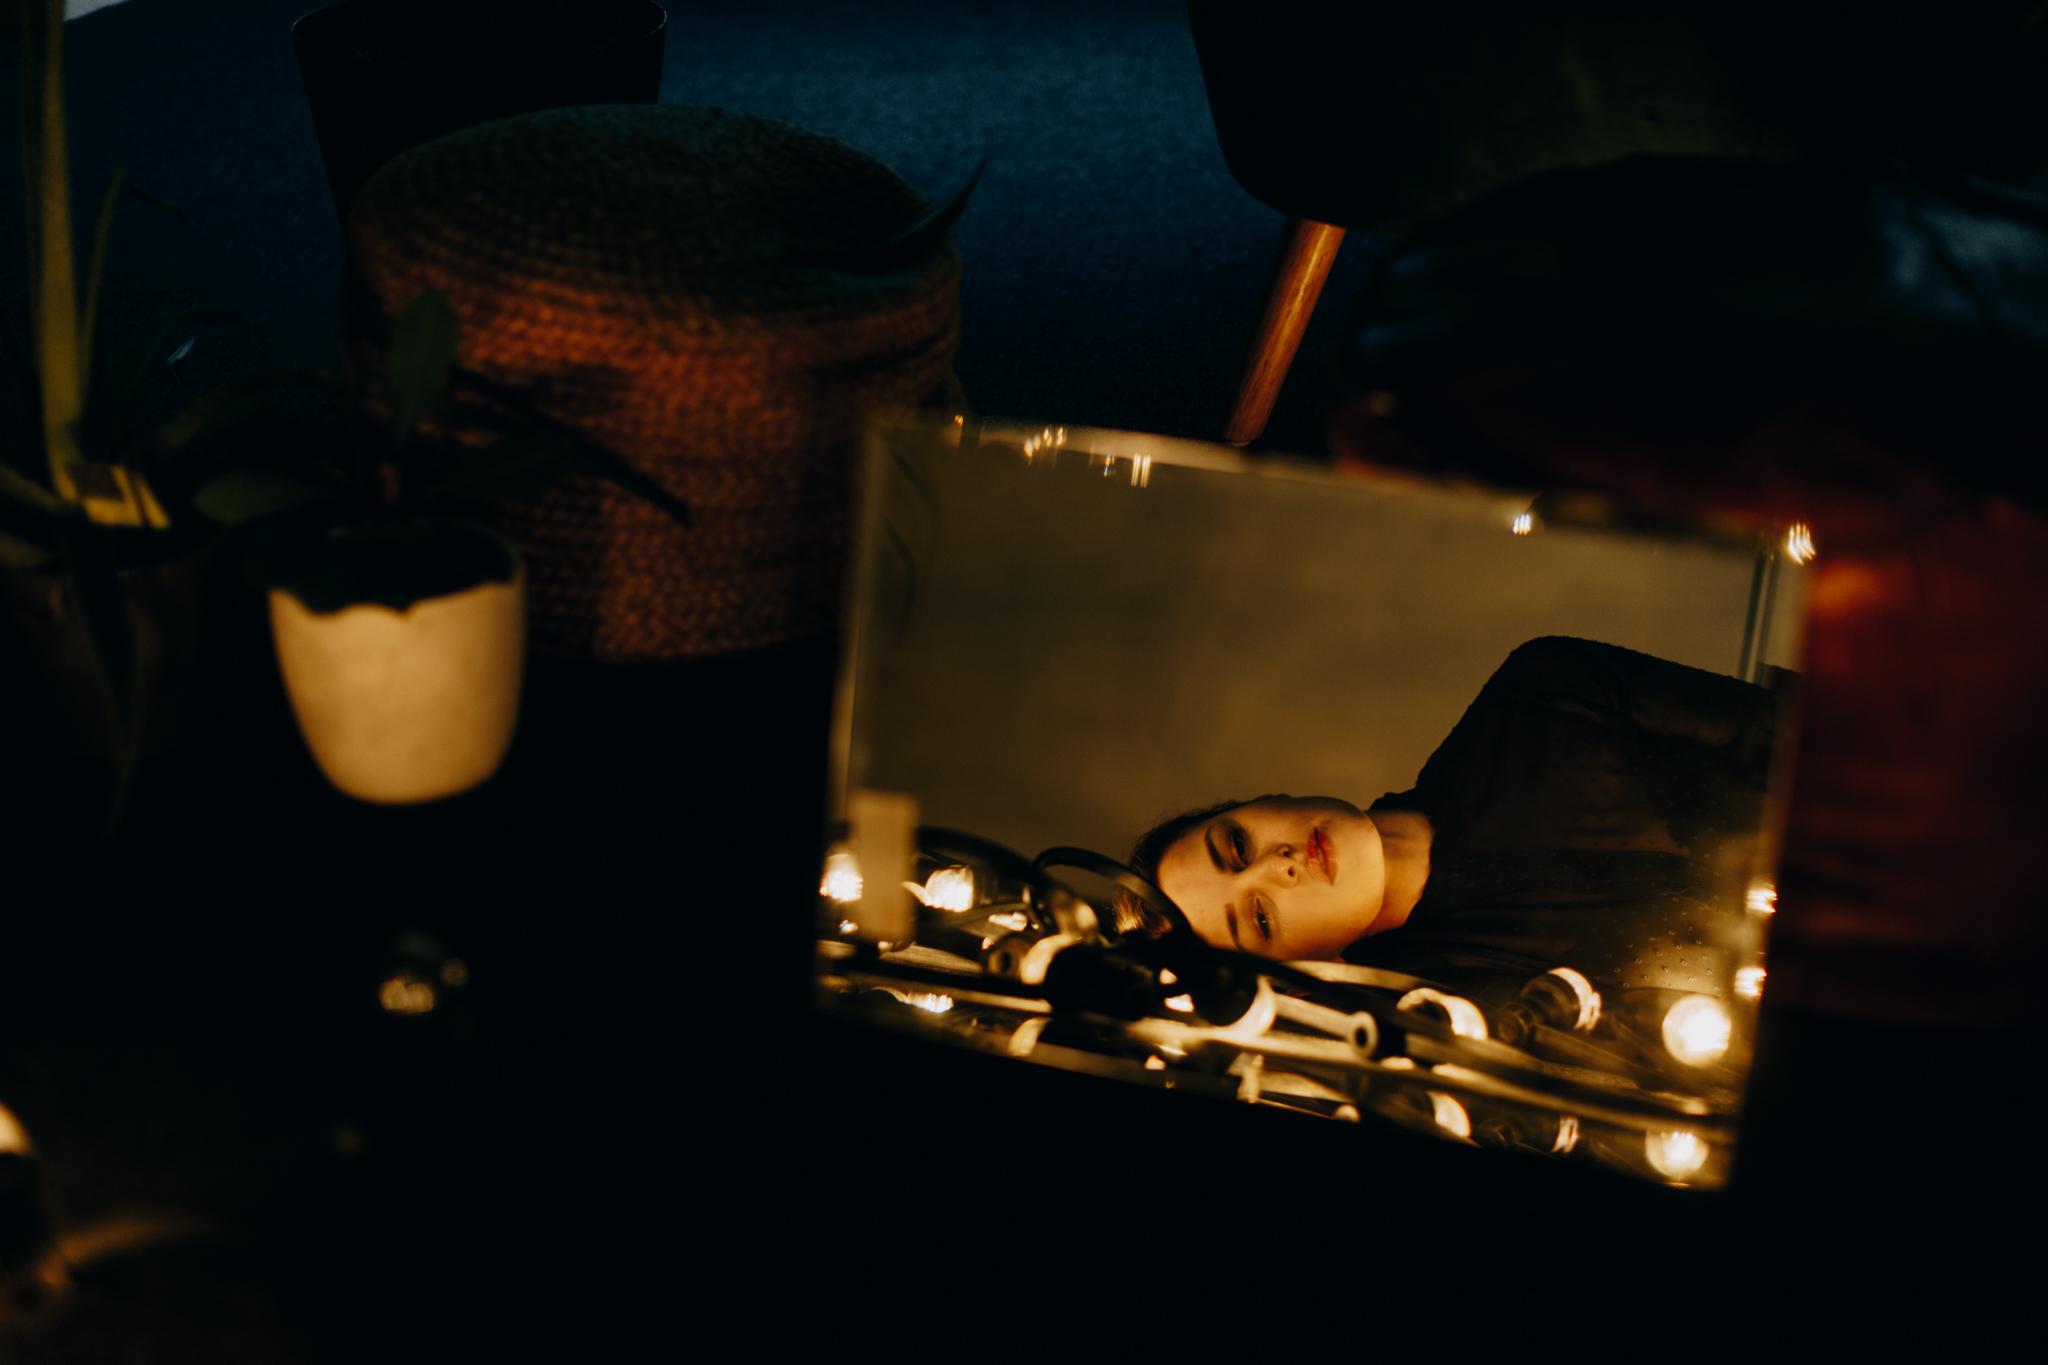 Girl looking in mirror while lying on floor